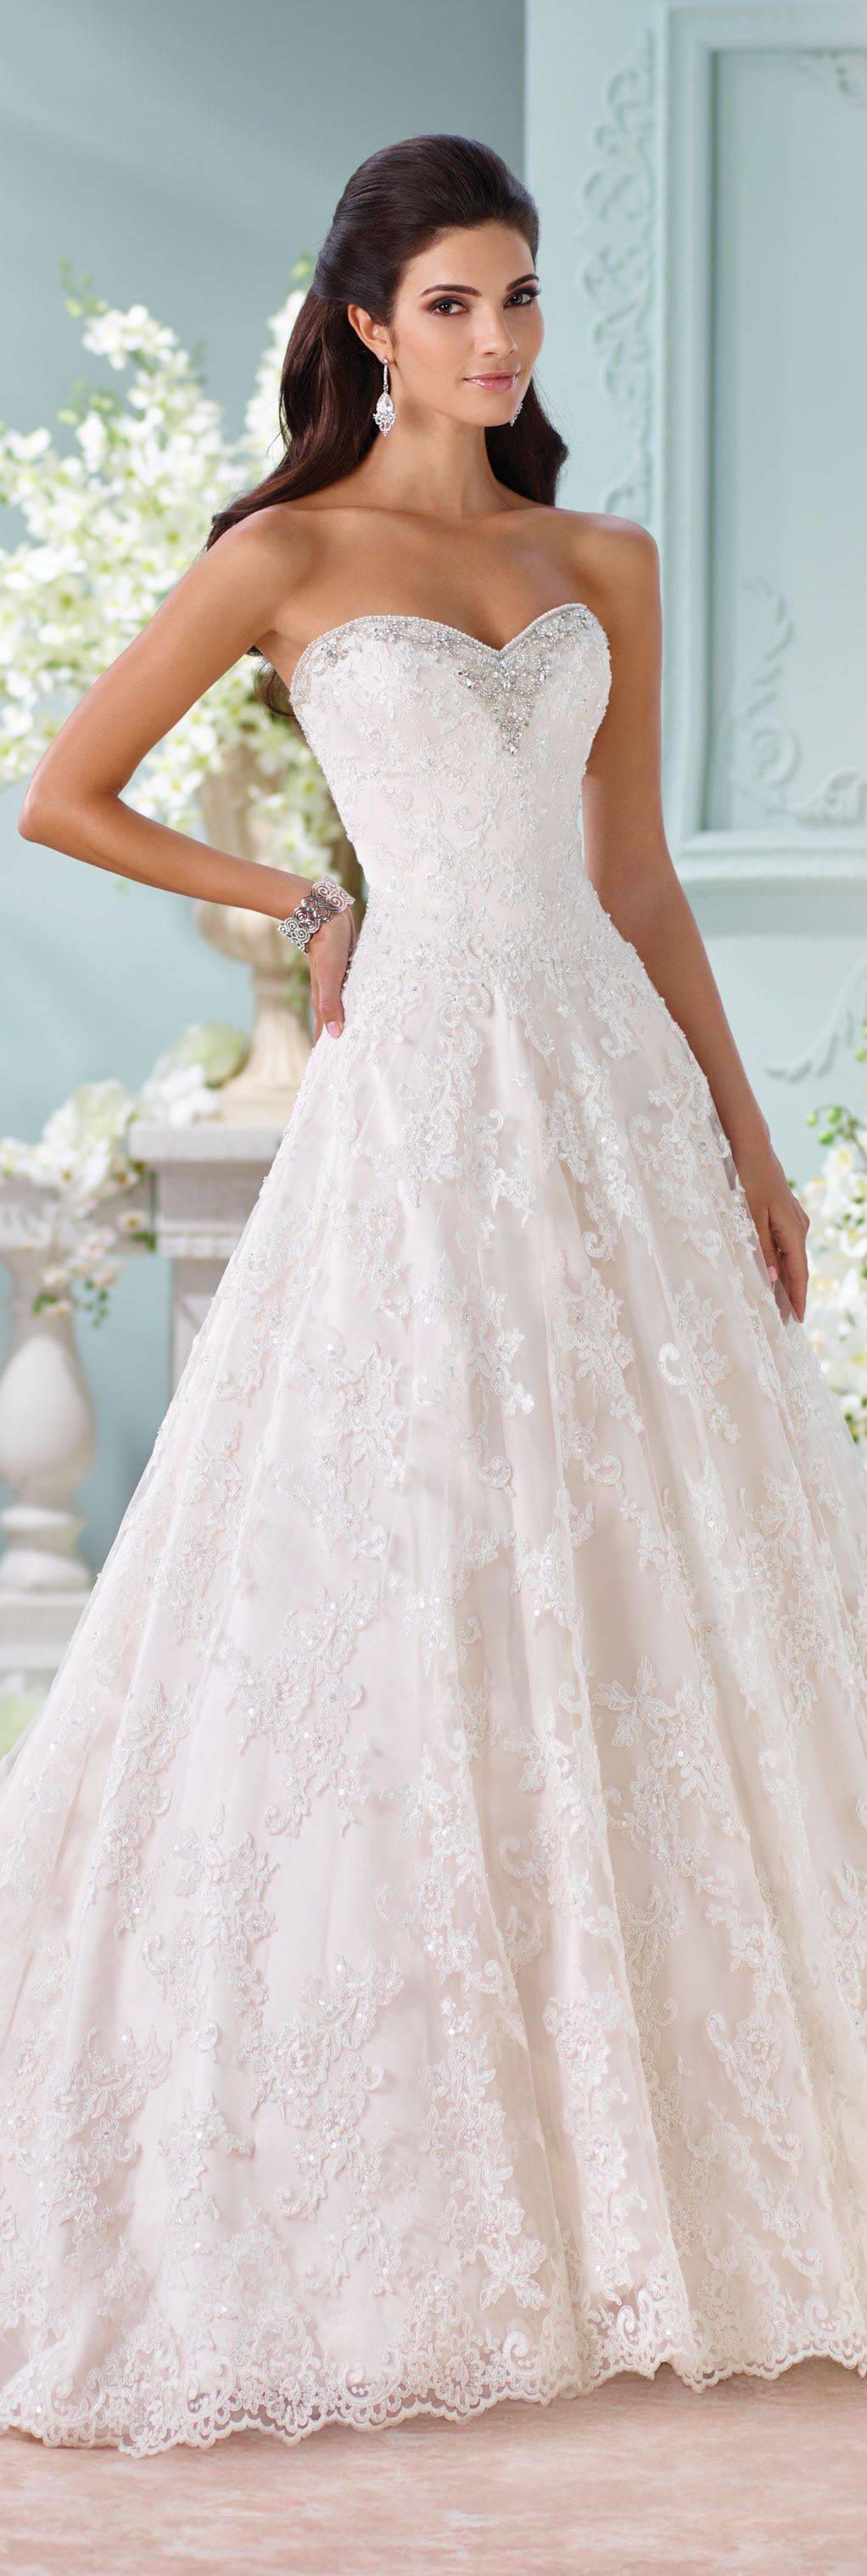 Unique wedding dresses fall martin thornburg david tutera